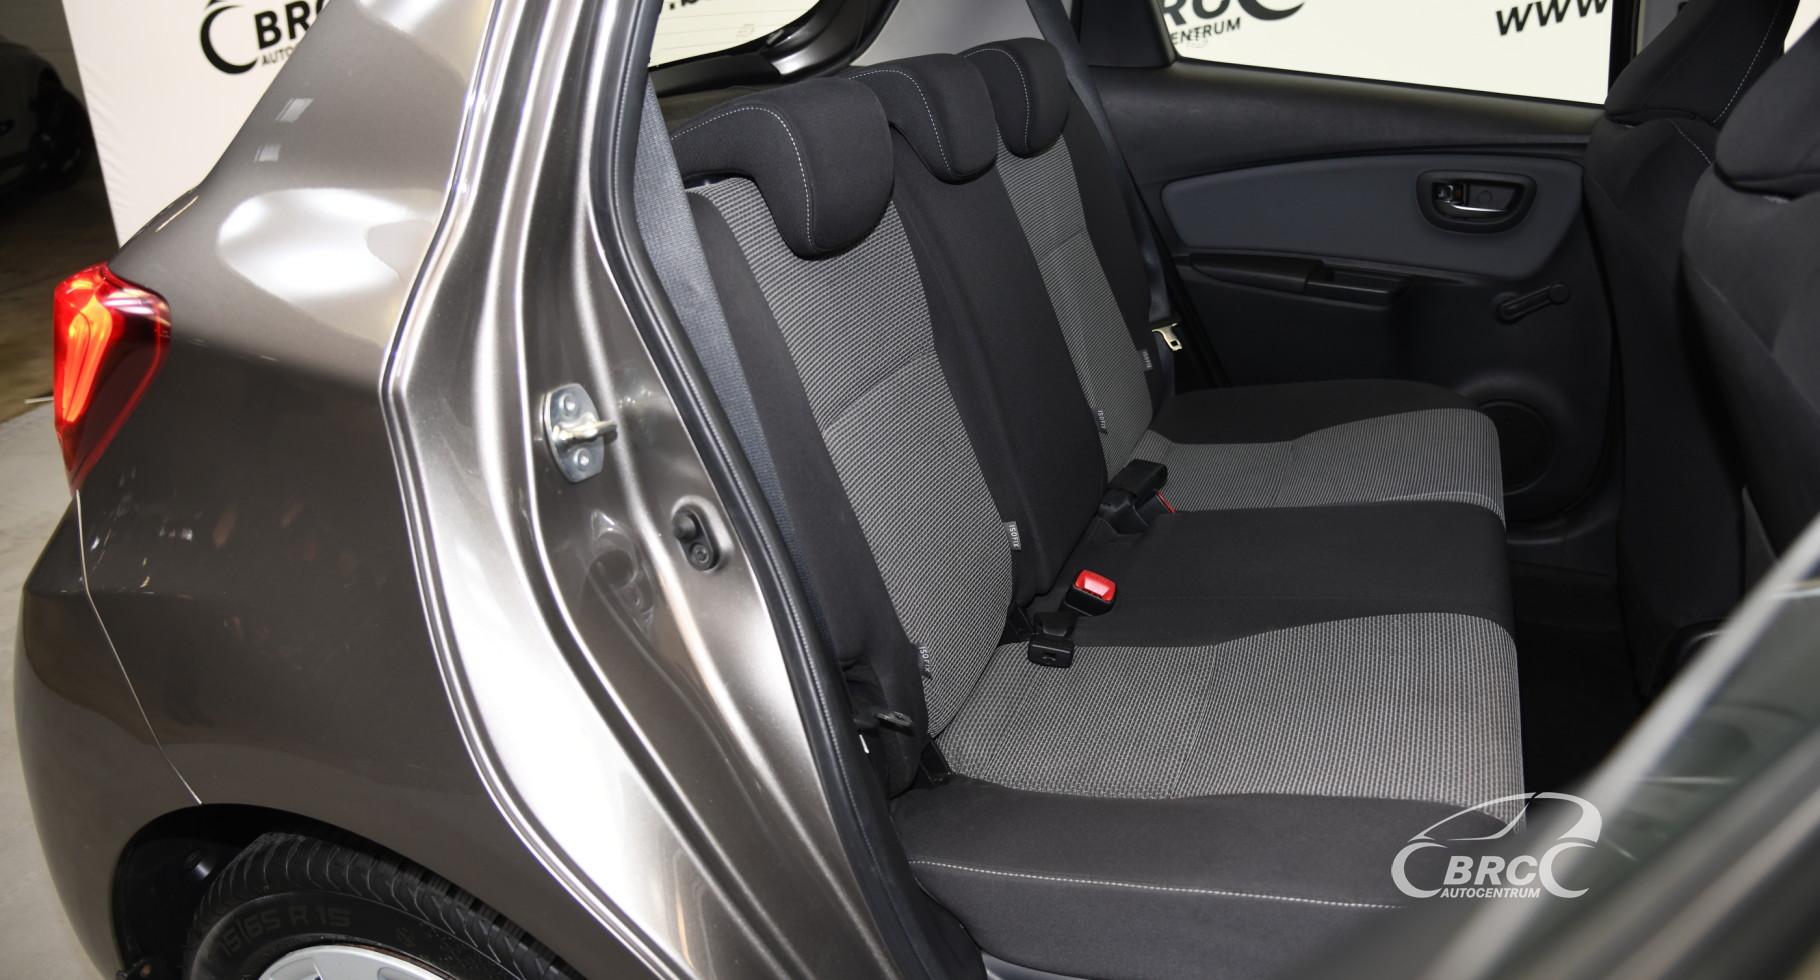 Toyota Yaris 1.5 Hybrid Automatas